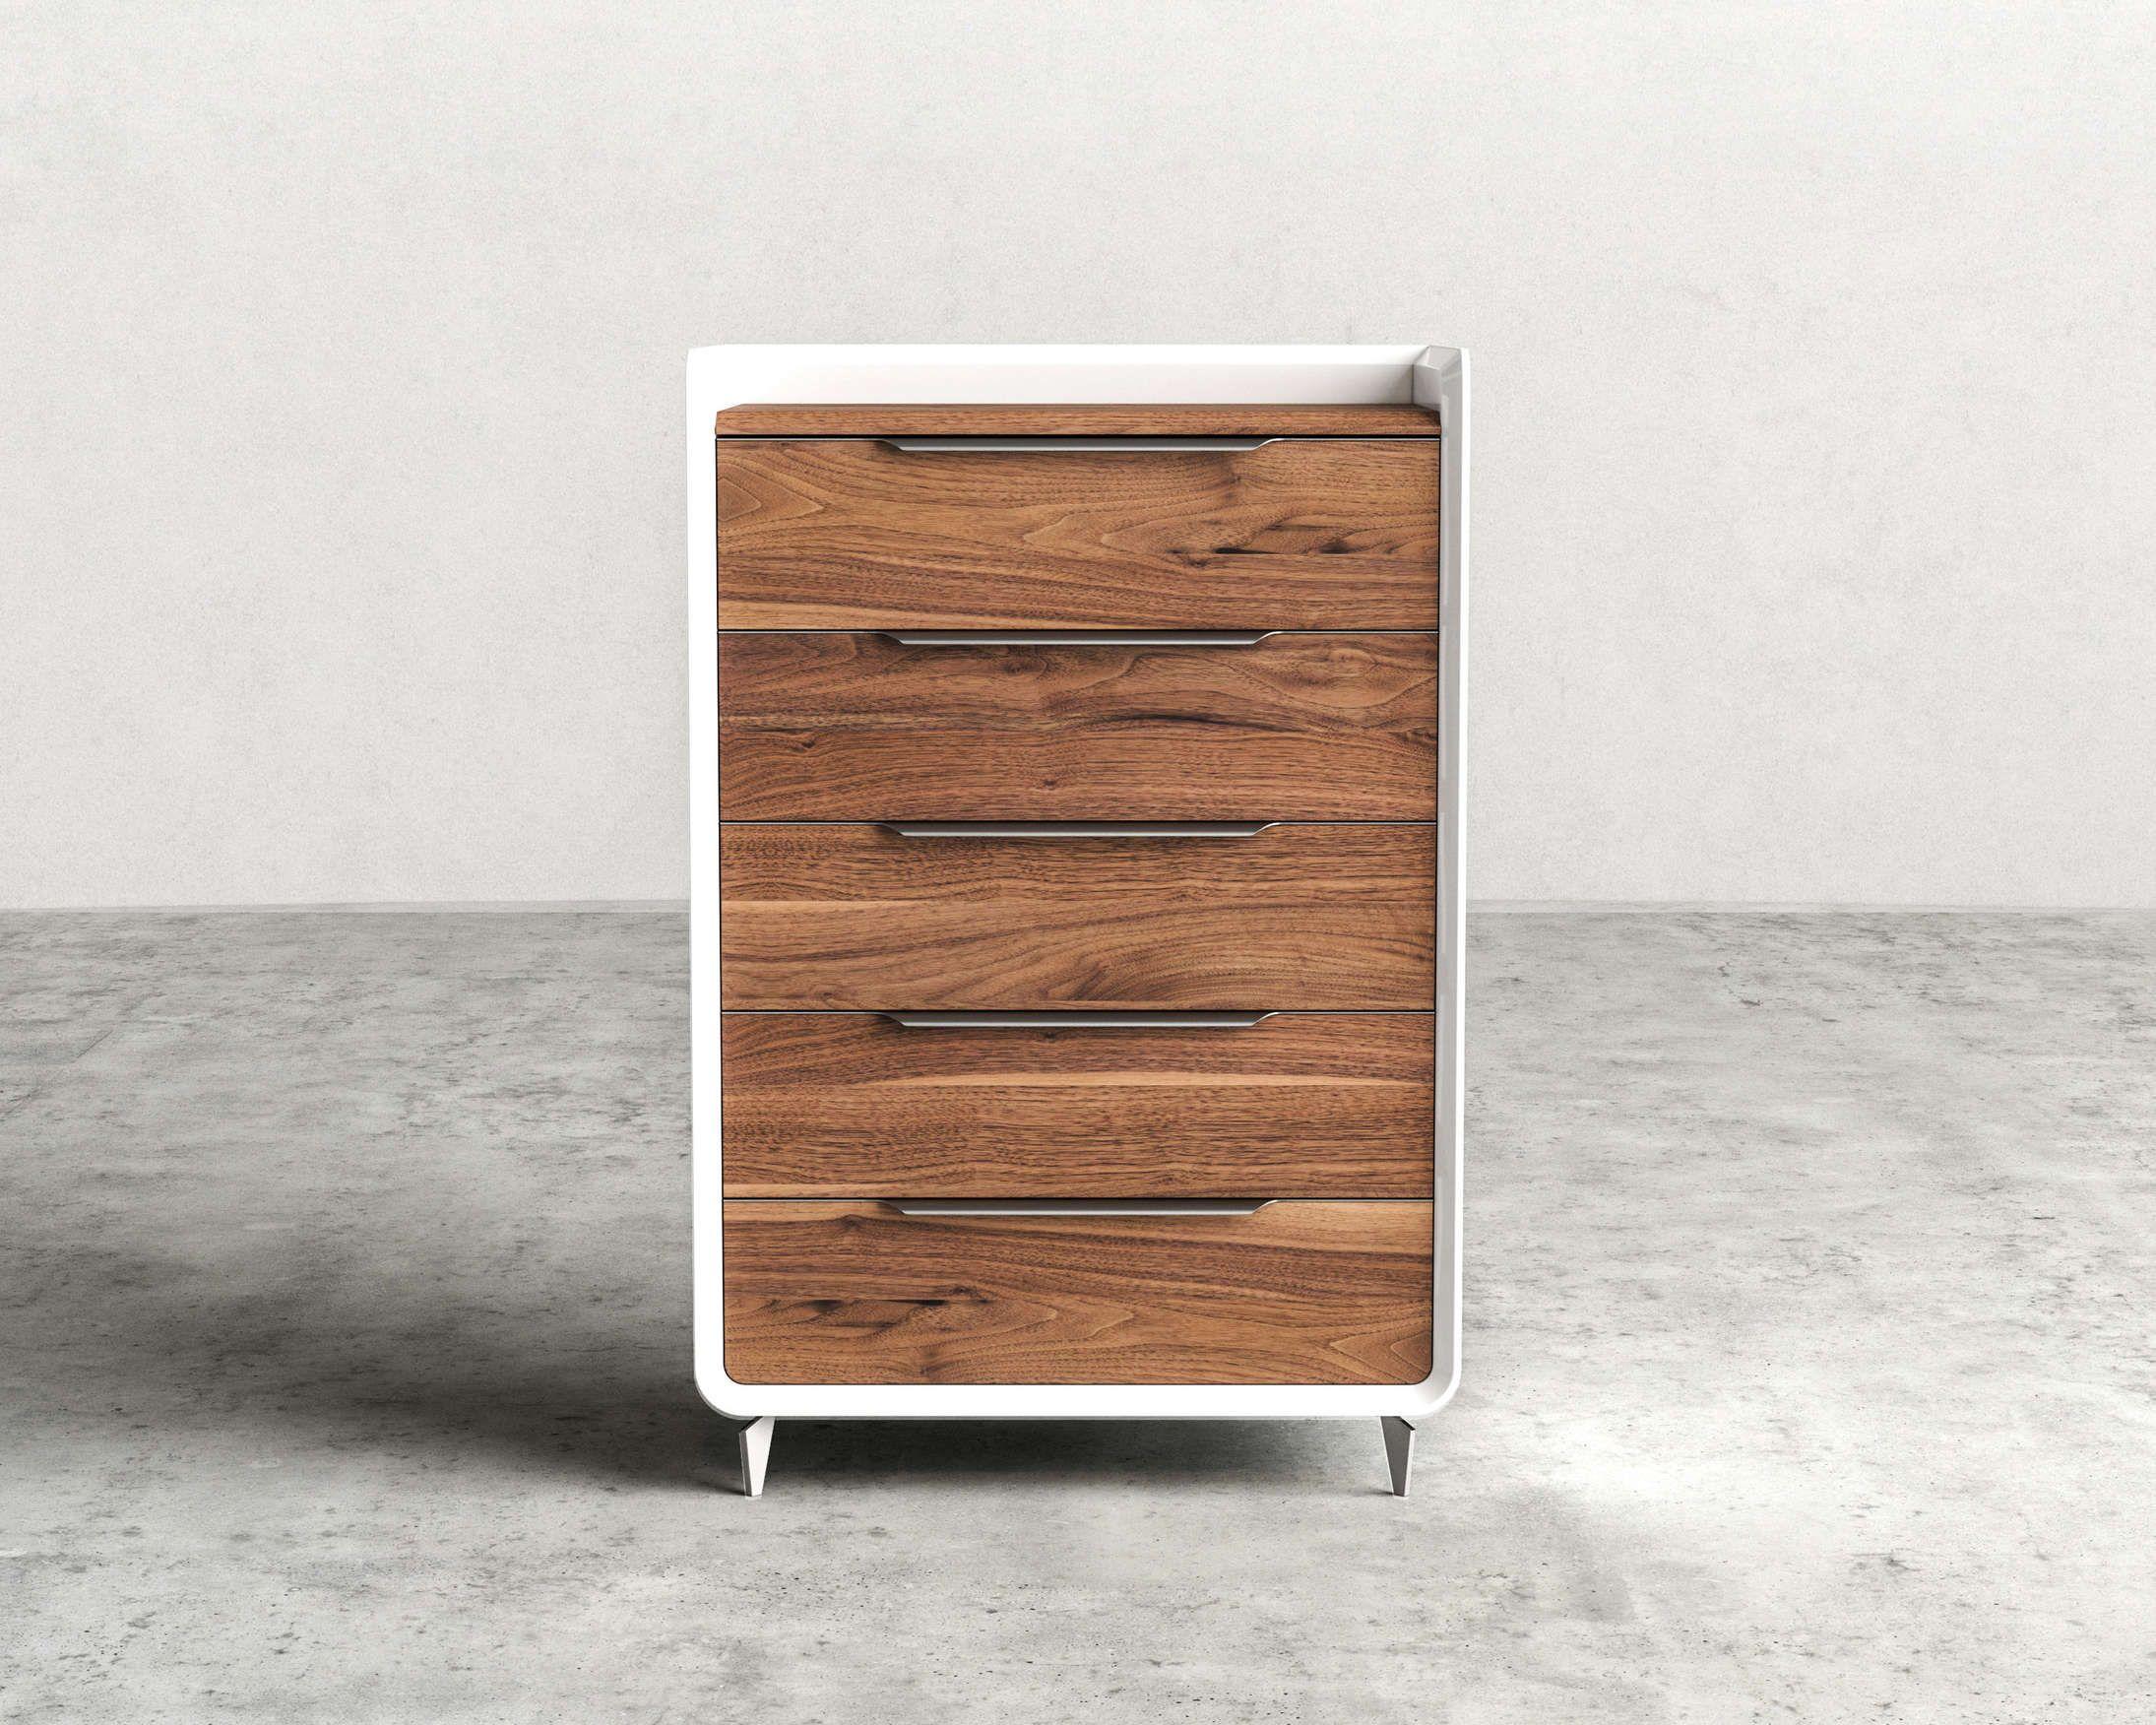 Grayson Tall Dresser Diy Furniture Bedroom Home Decor Bedroom Repurposed Furniture [ 1752 x 2190 Pixel ]